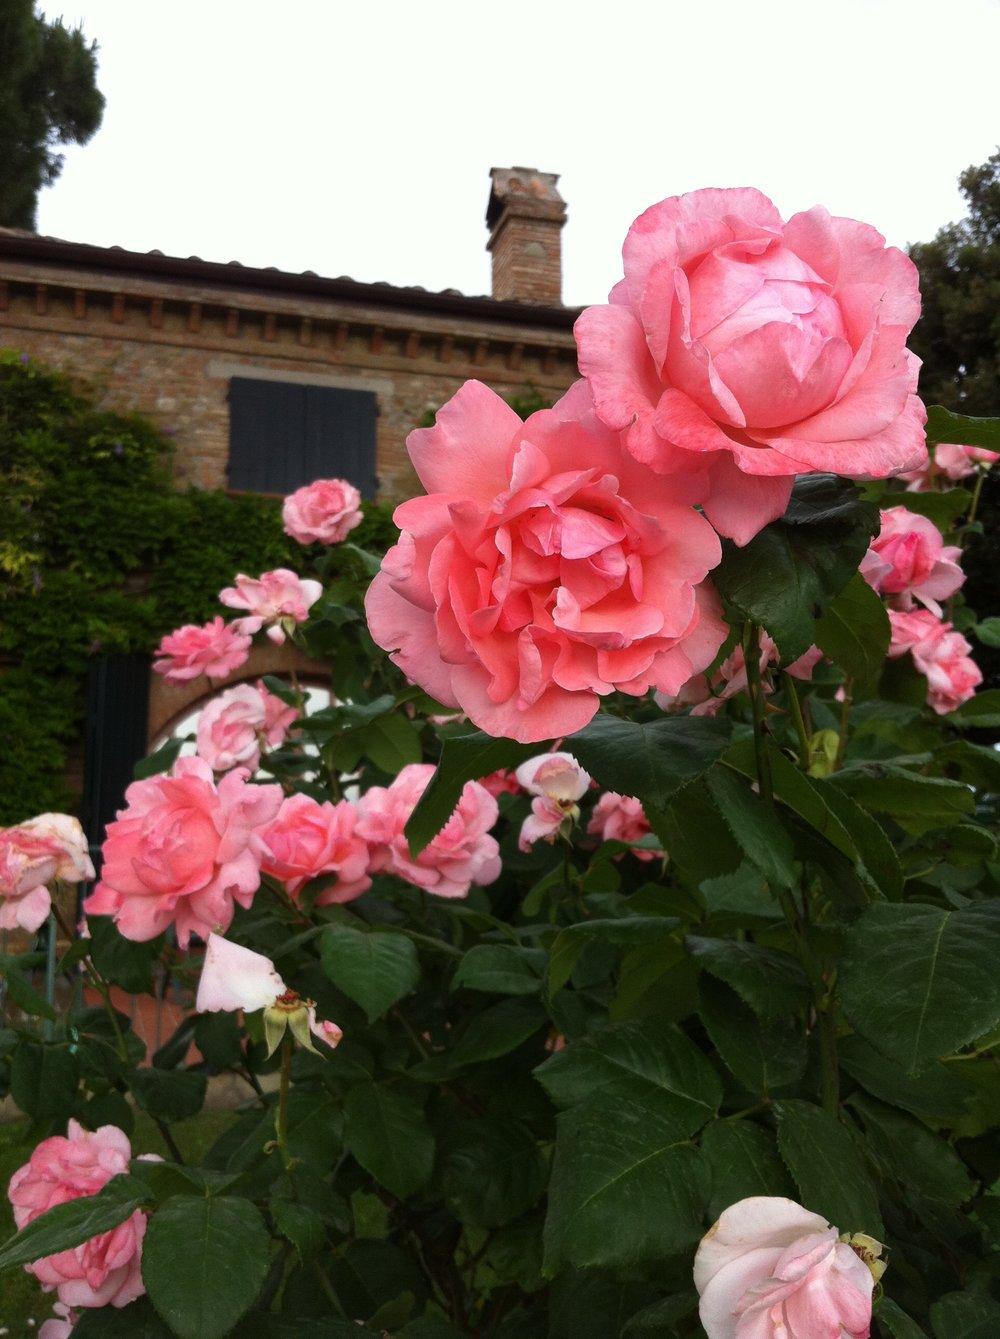 pink-rose-villa-behind.jpg